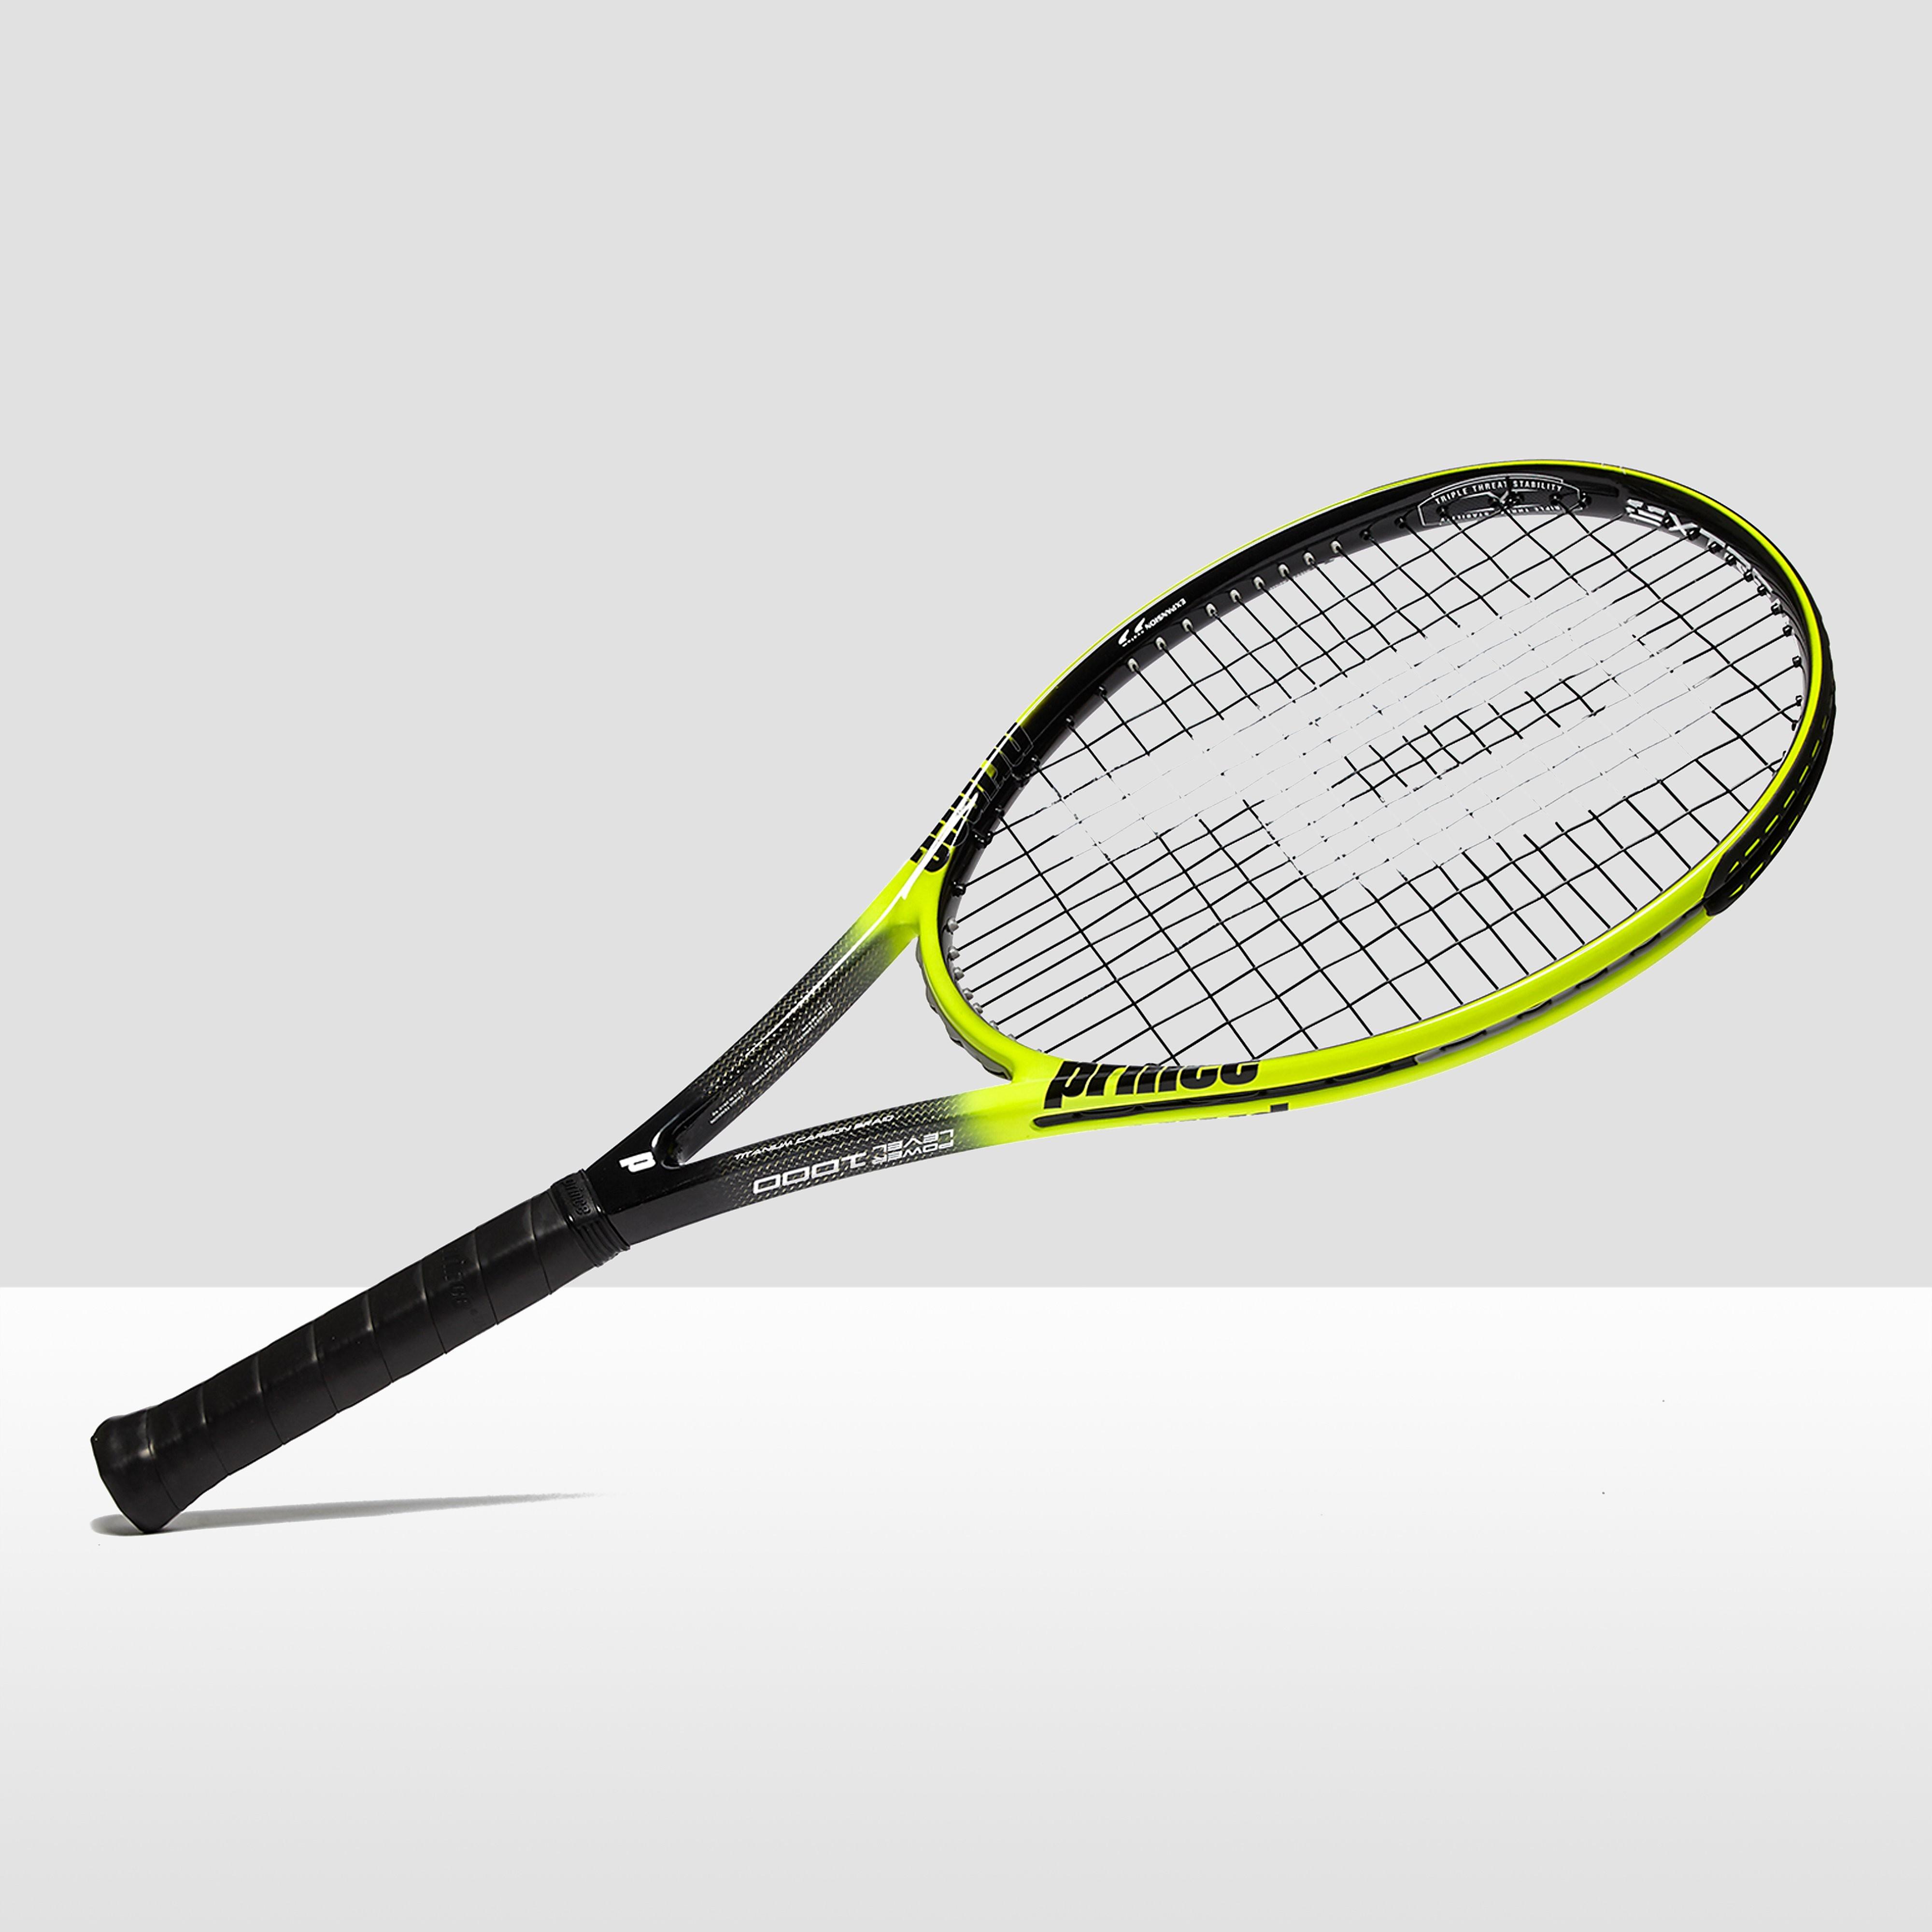 Prince Thunder Blast 105 Tennis Racket